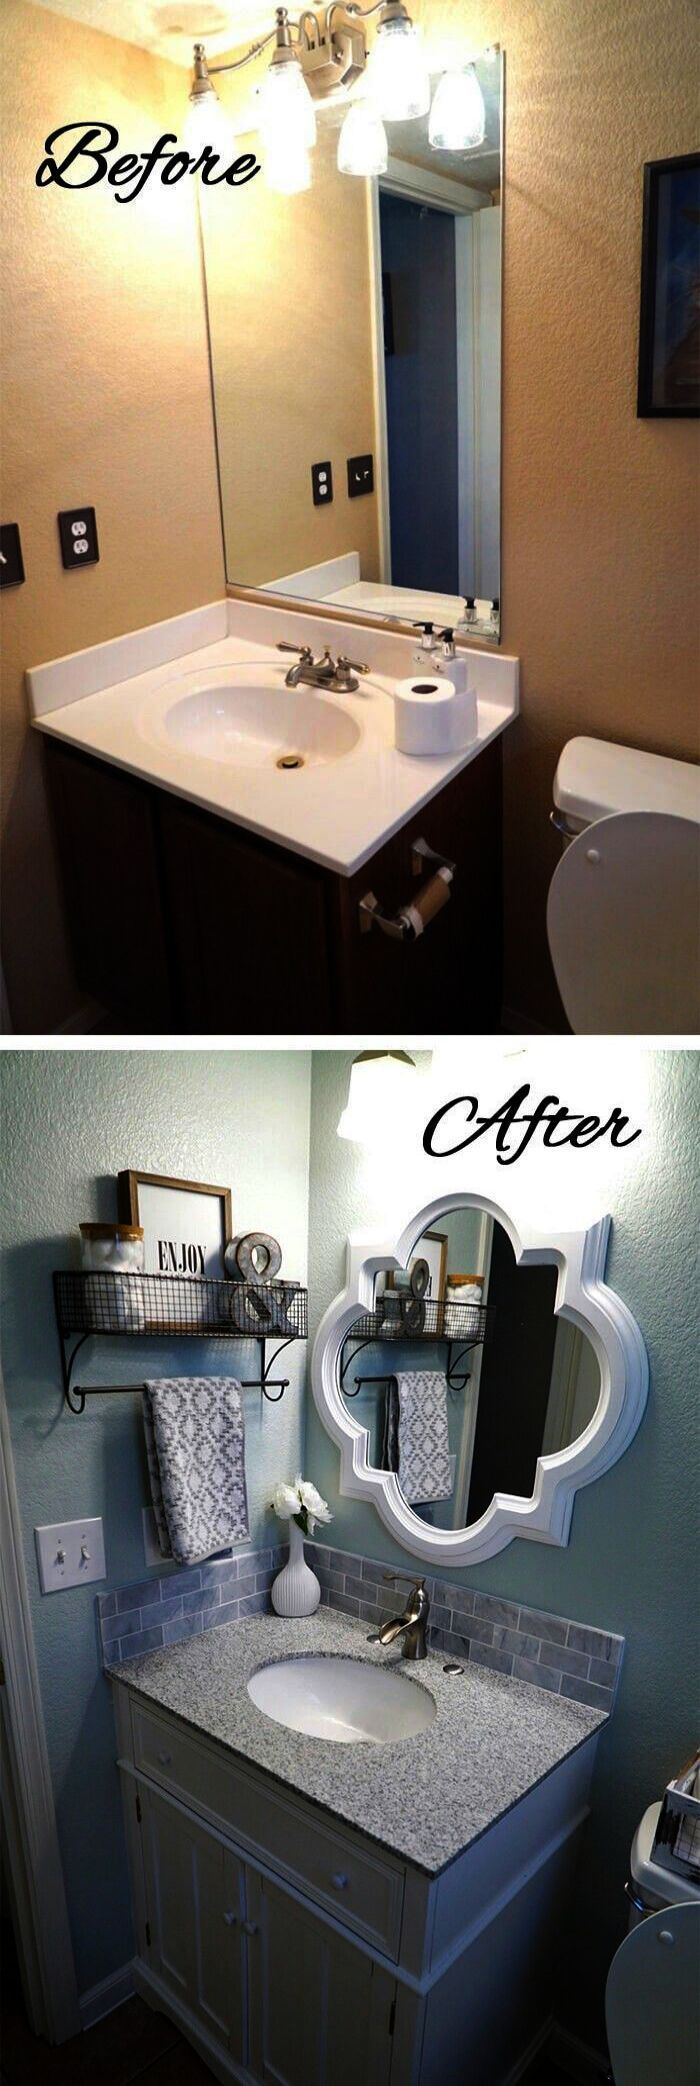 Bathroom Cabinets Shelves lest Bathroom Ideas Above Toilet although Bathroom Ide…   – most beautiful shelves